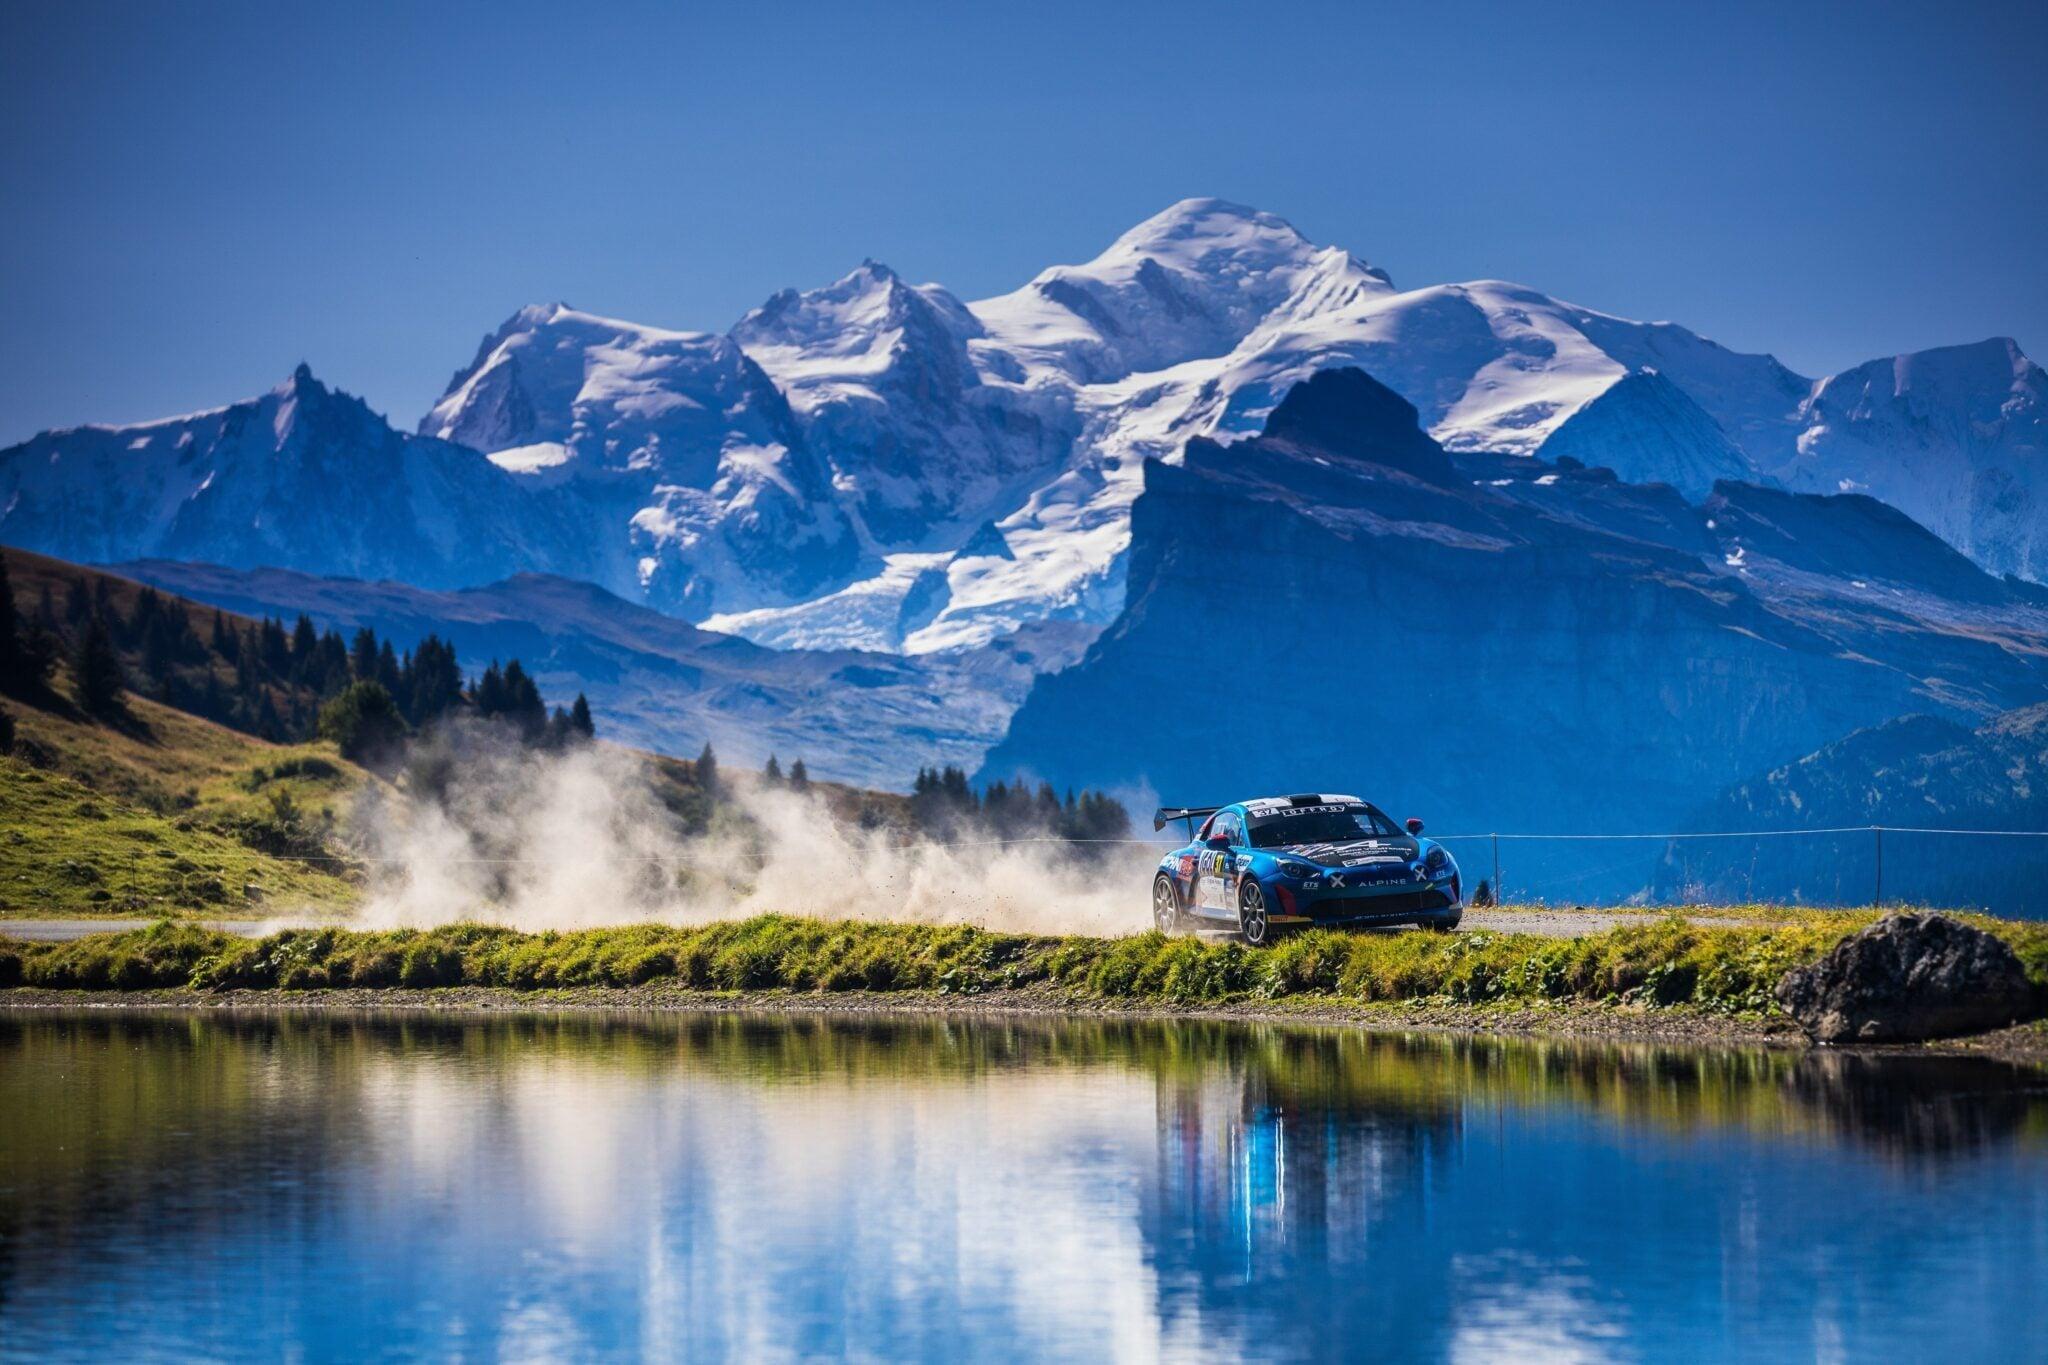 Alpine A110 Rally Mont Blanc Morzine Rallye FFSA 2020 8 | Alpine A110 Rally: Carton plein au rallye Mont-Blanc Morzine 2020